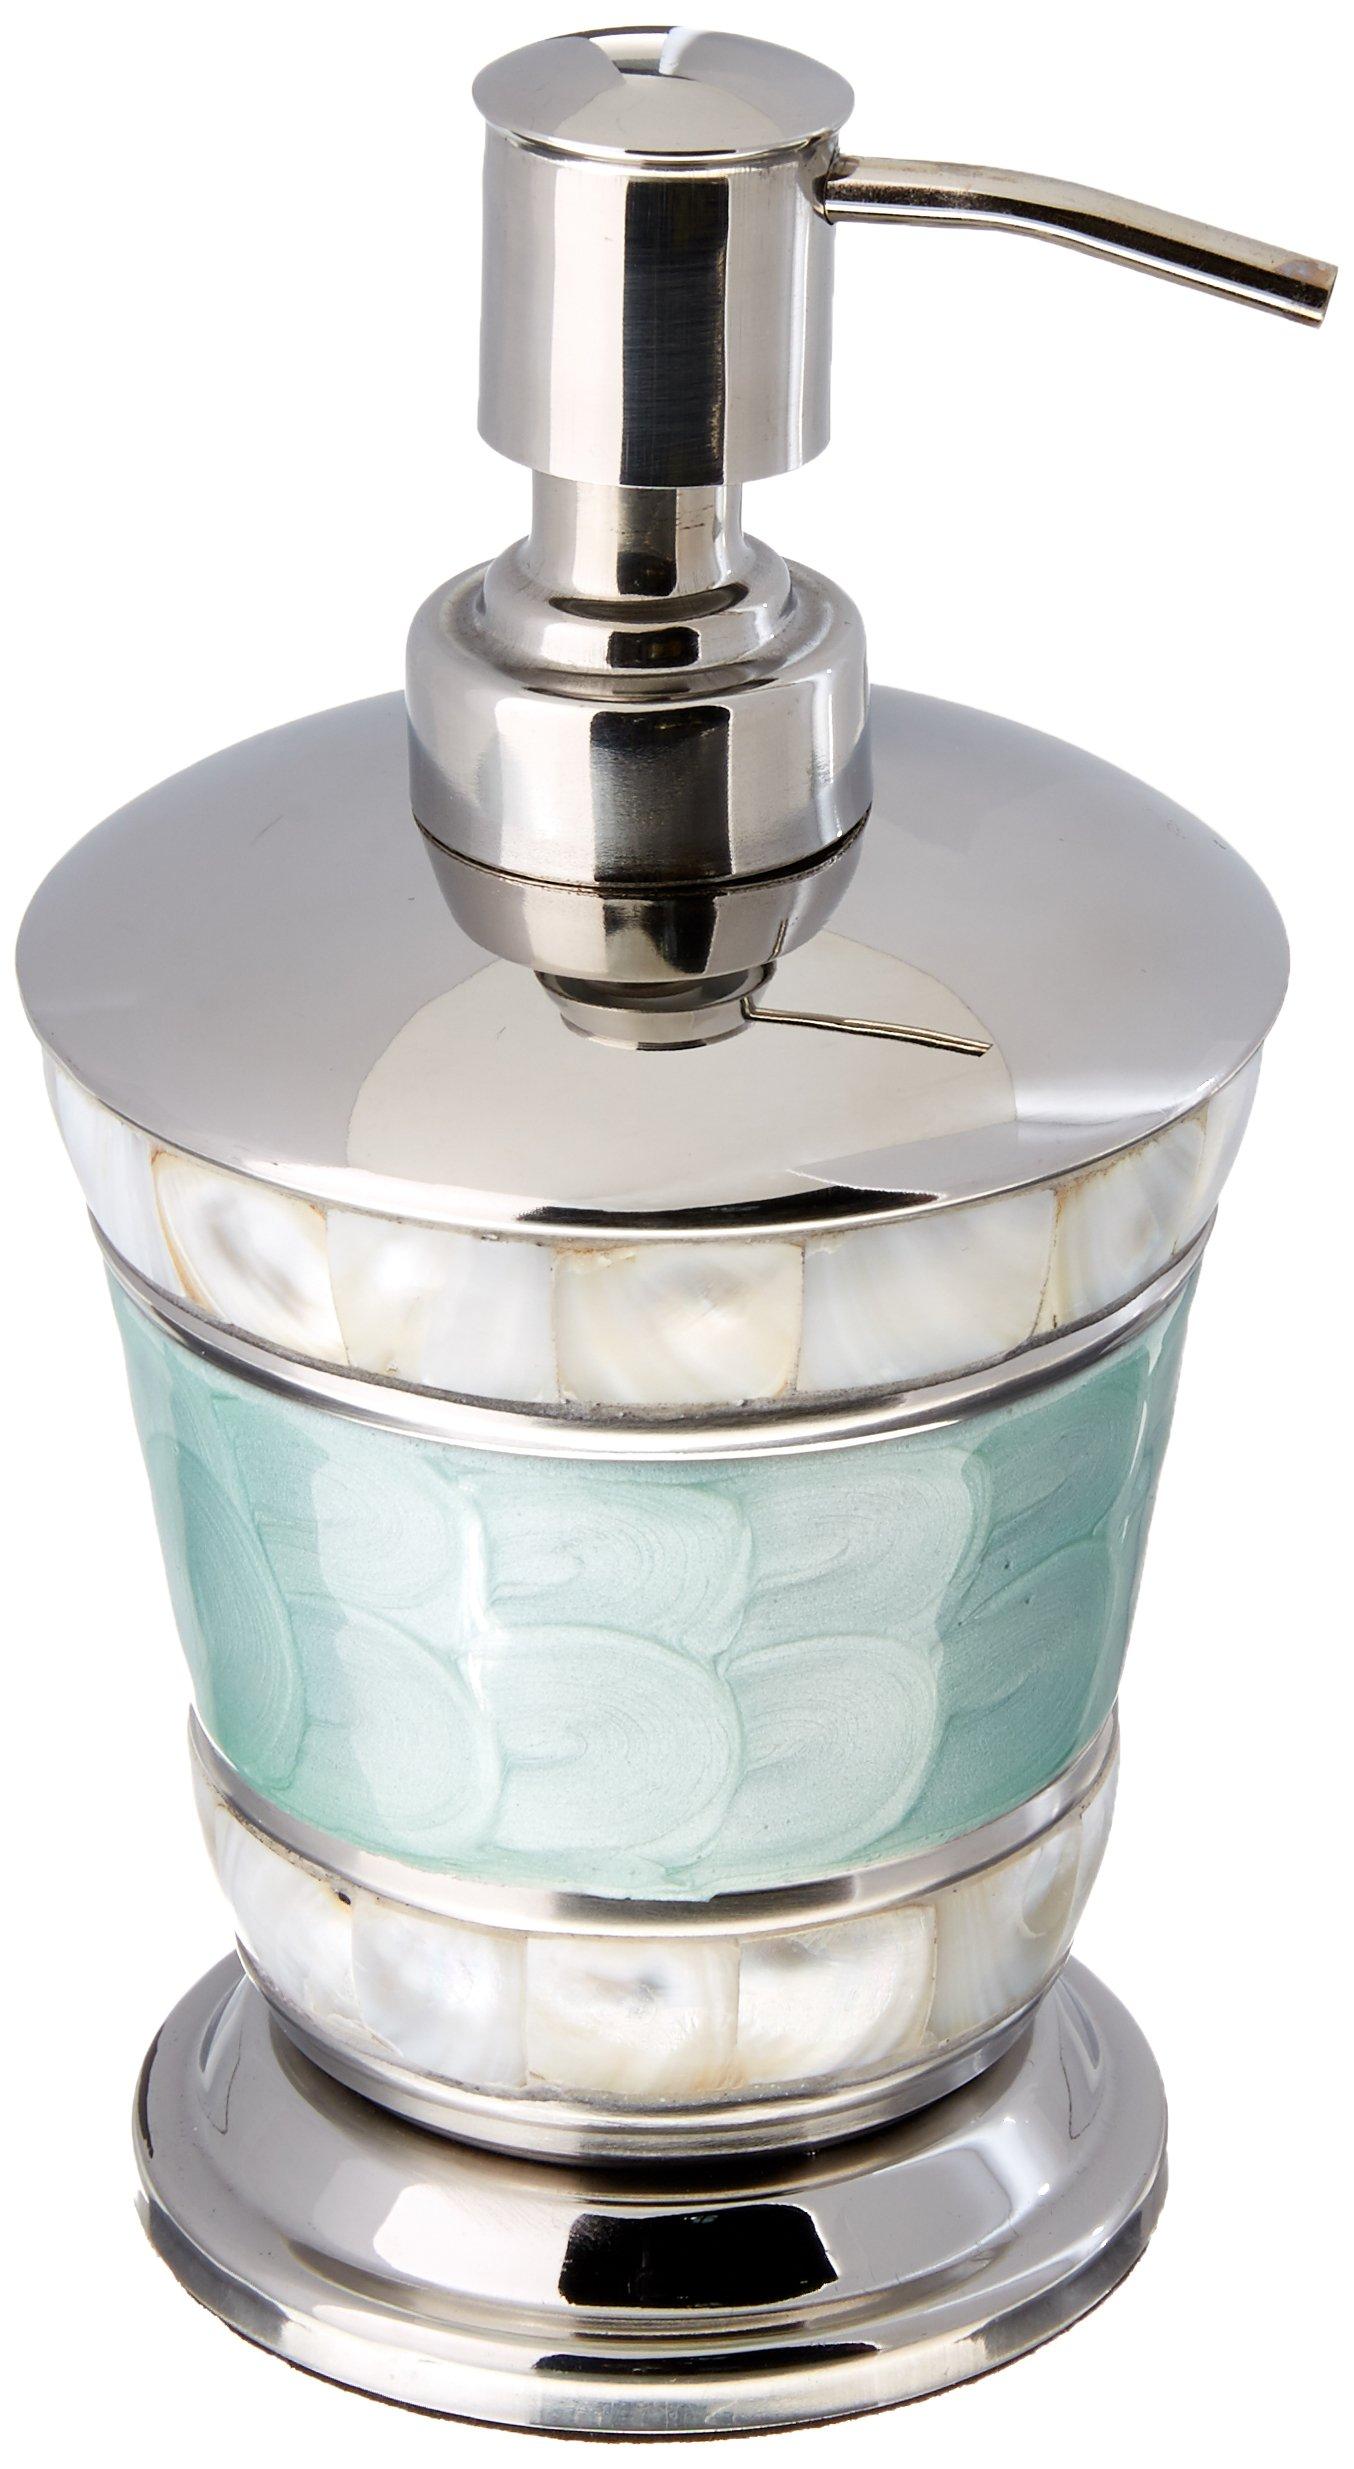 Julia Knight Classic 7'' Soap/Lotion Dispenser, One Size, Aqua